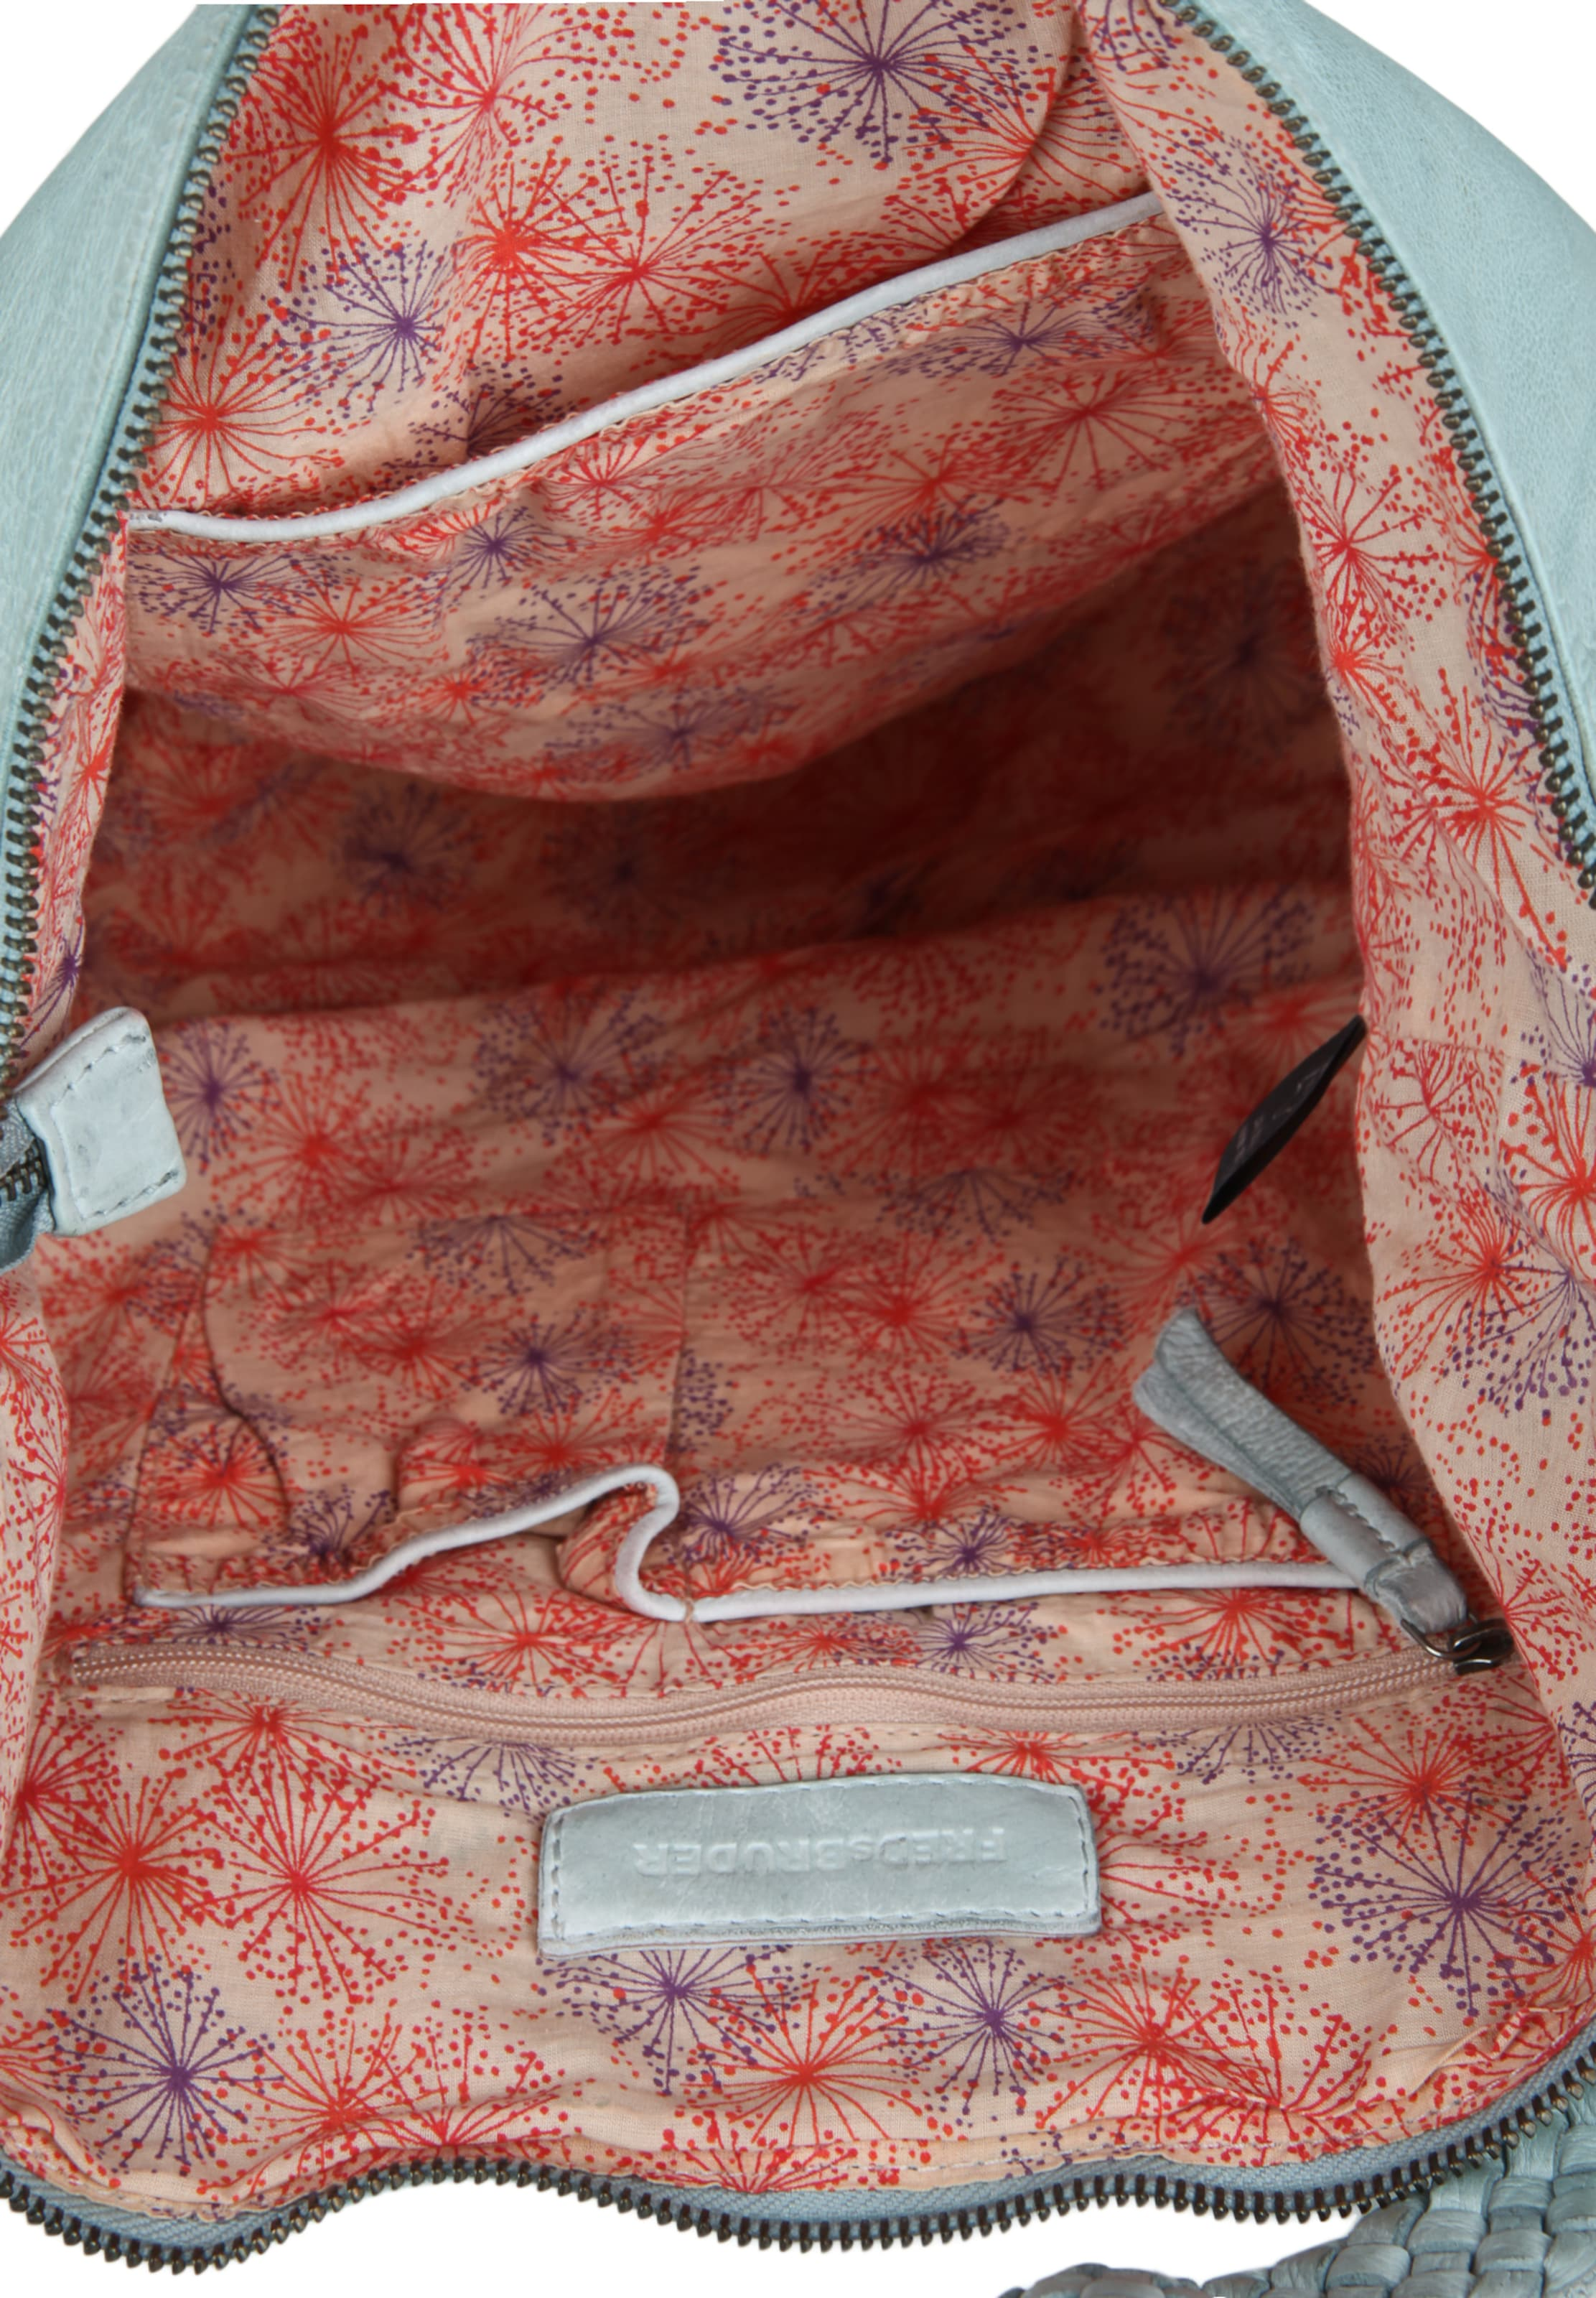 Umhängetasche Fredsbruder In Fredsbruder 'palms' Umhängetasche Opal DH9E2I